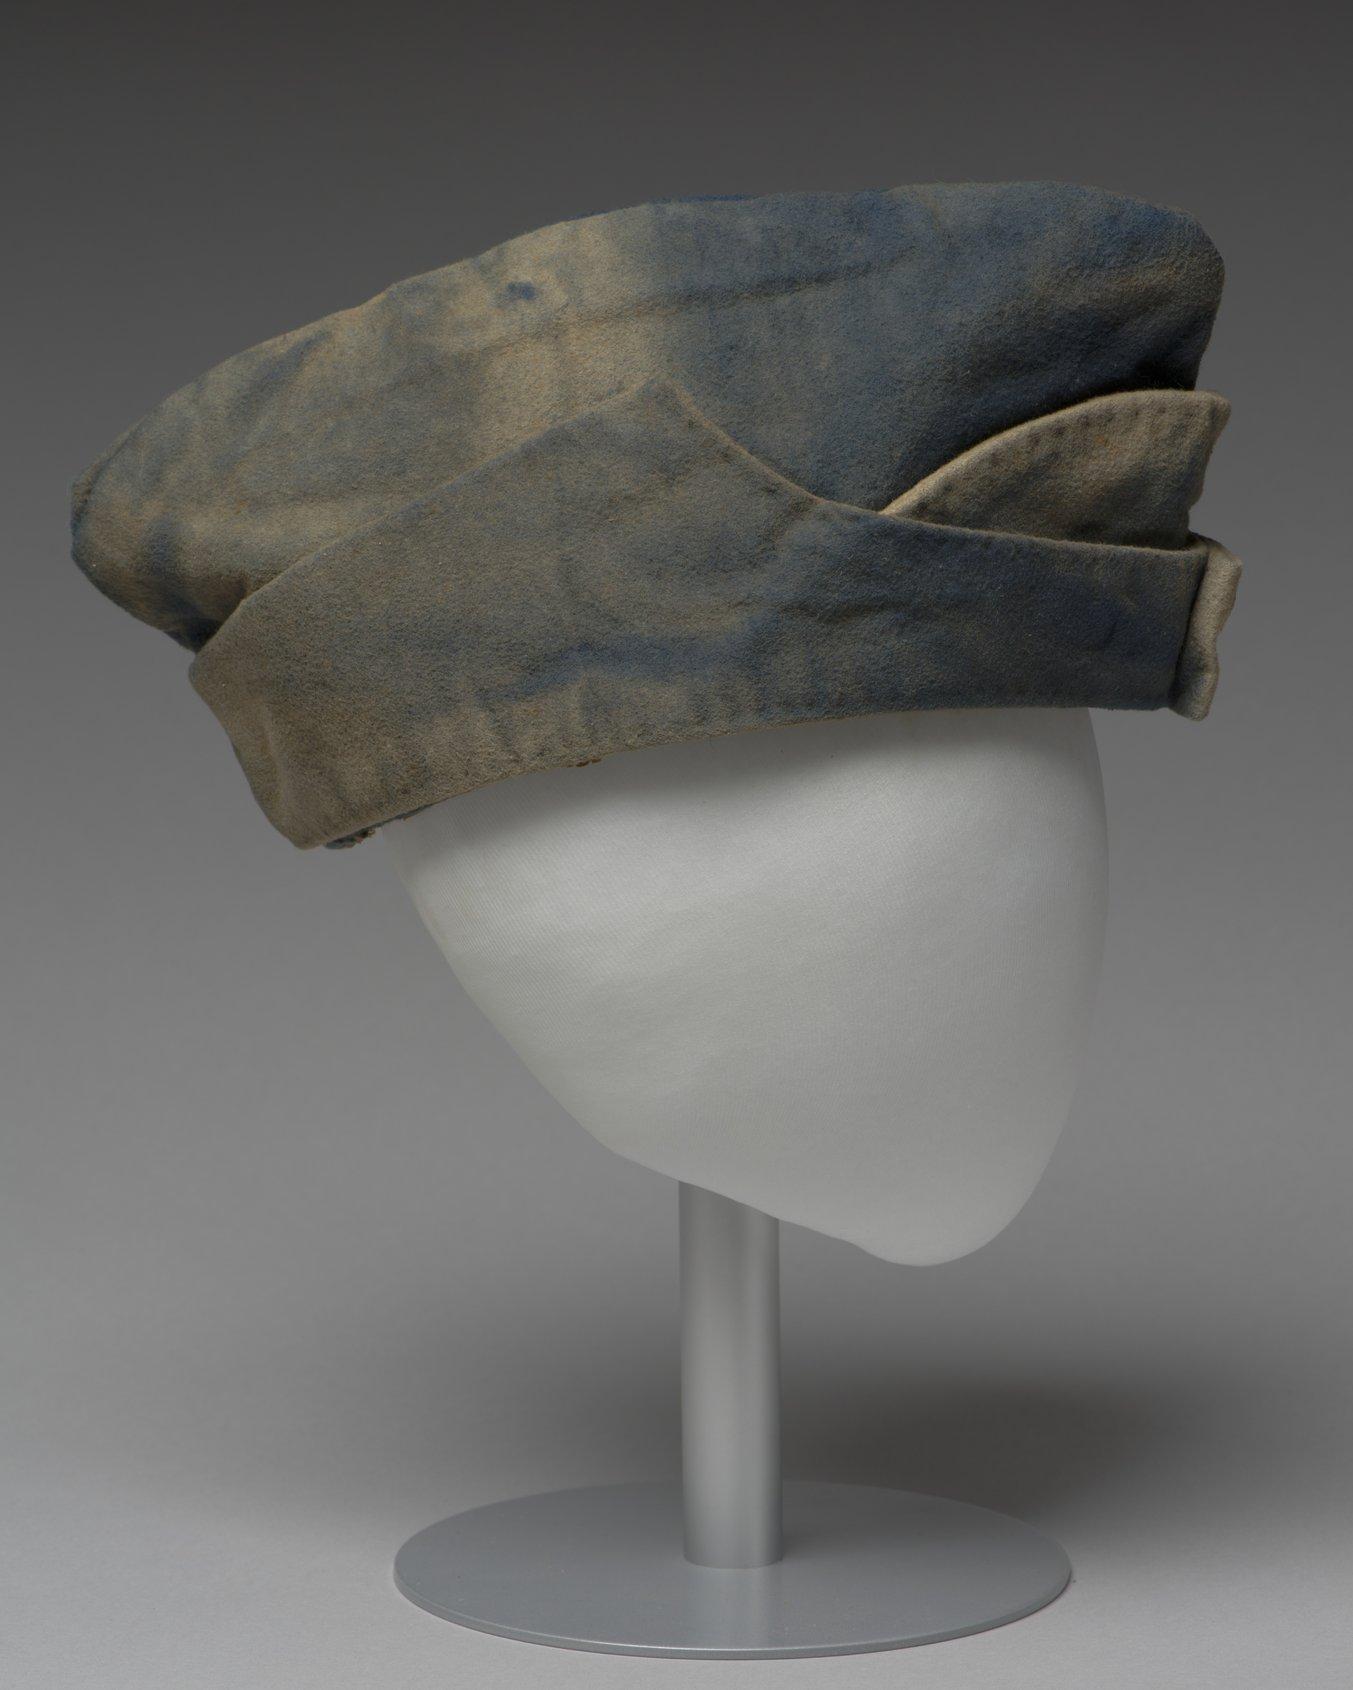 Handmade cap - 3